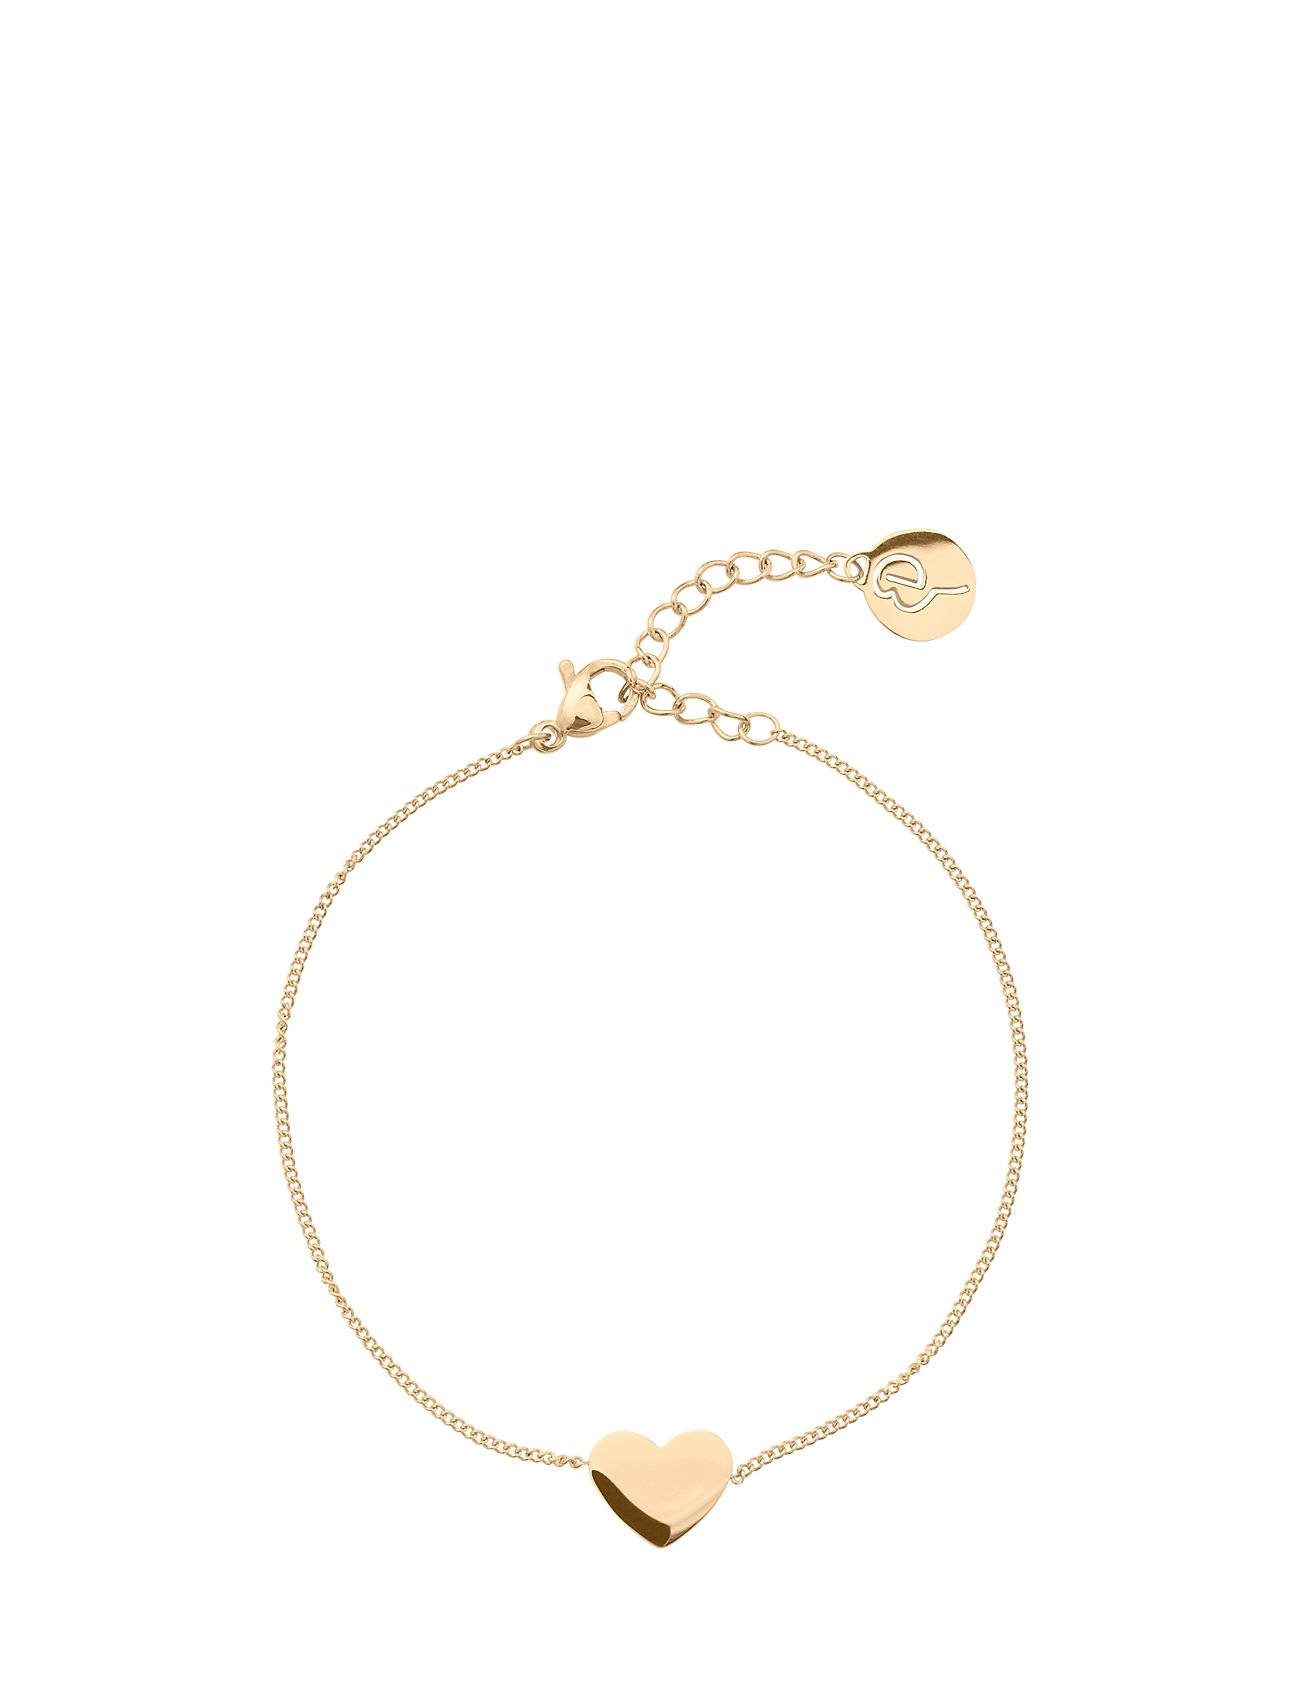 Edblad Pure Heart Bracelet Gold Accessories Jewellery Bracelets Chain Bracelets Kulta Edblad